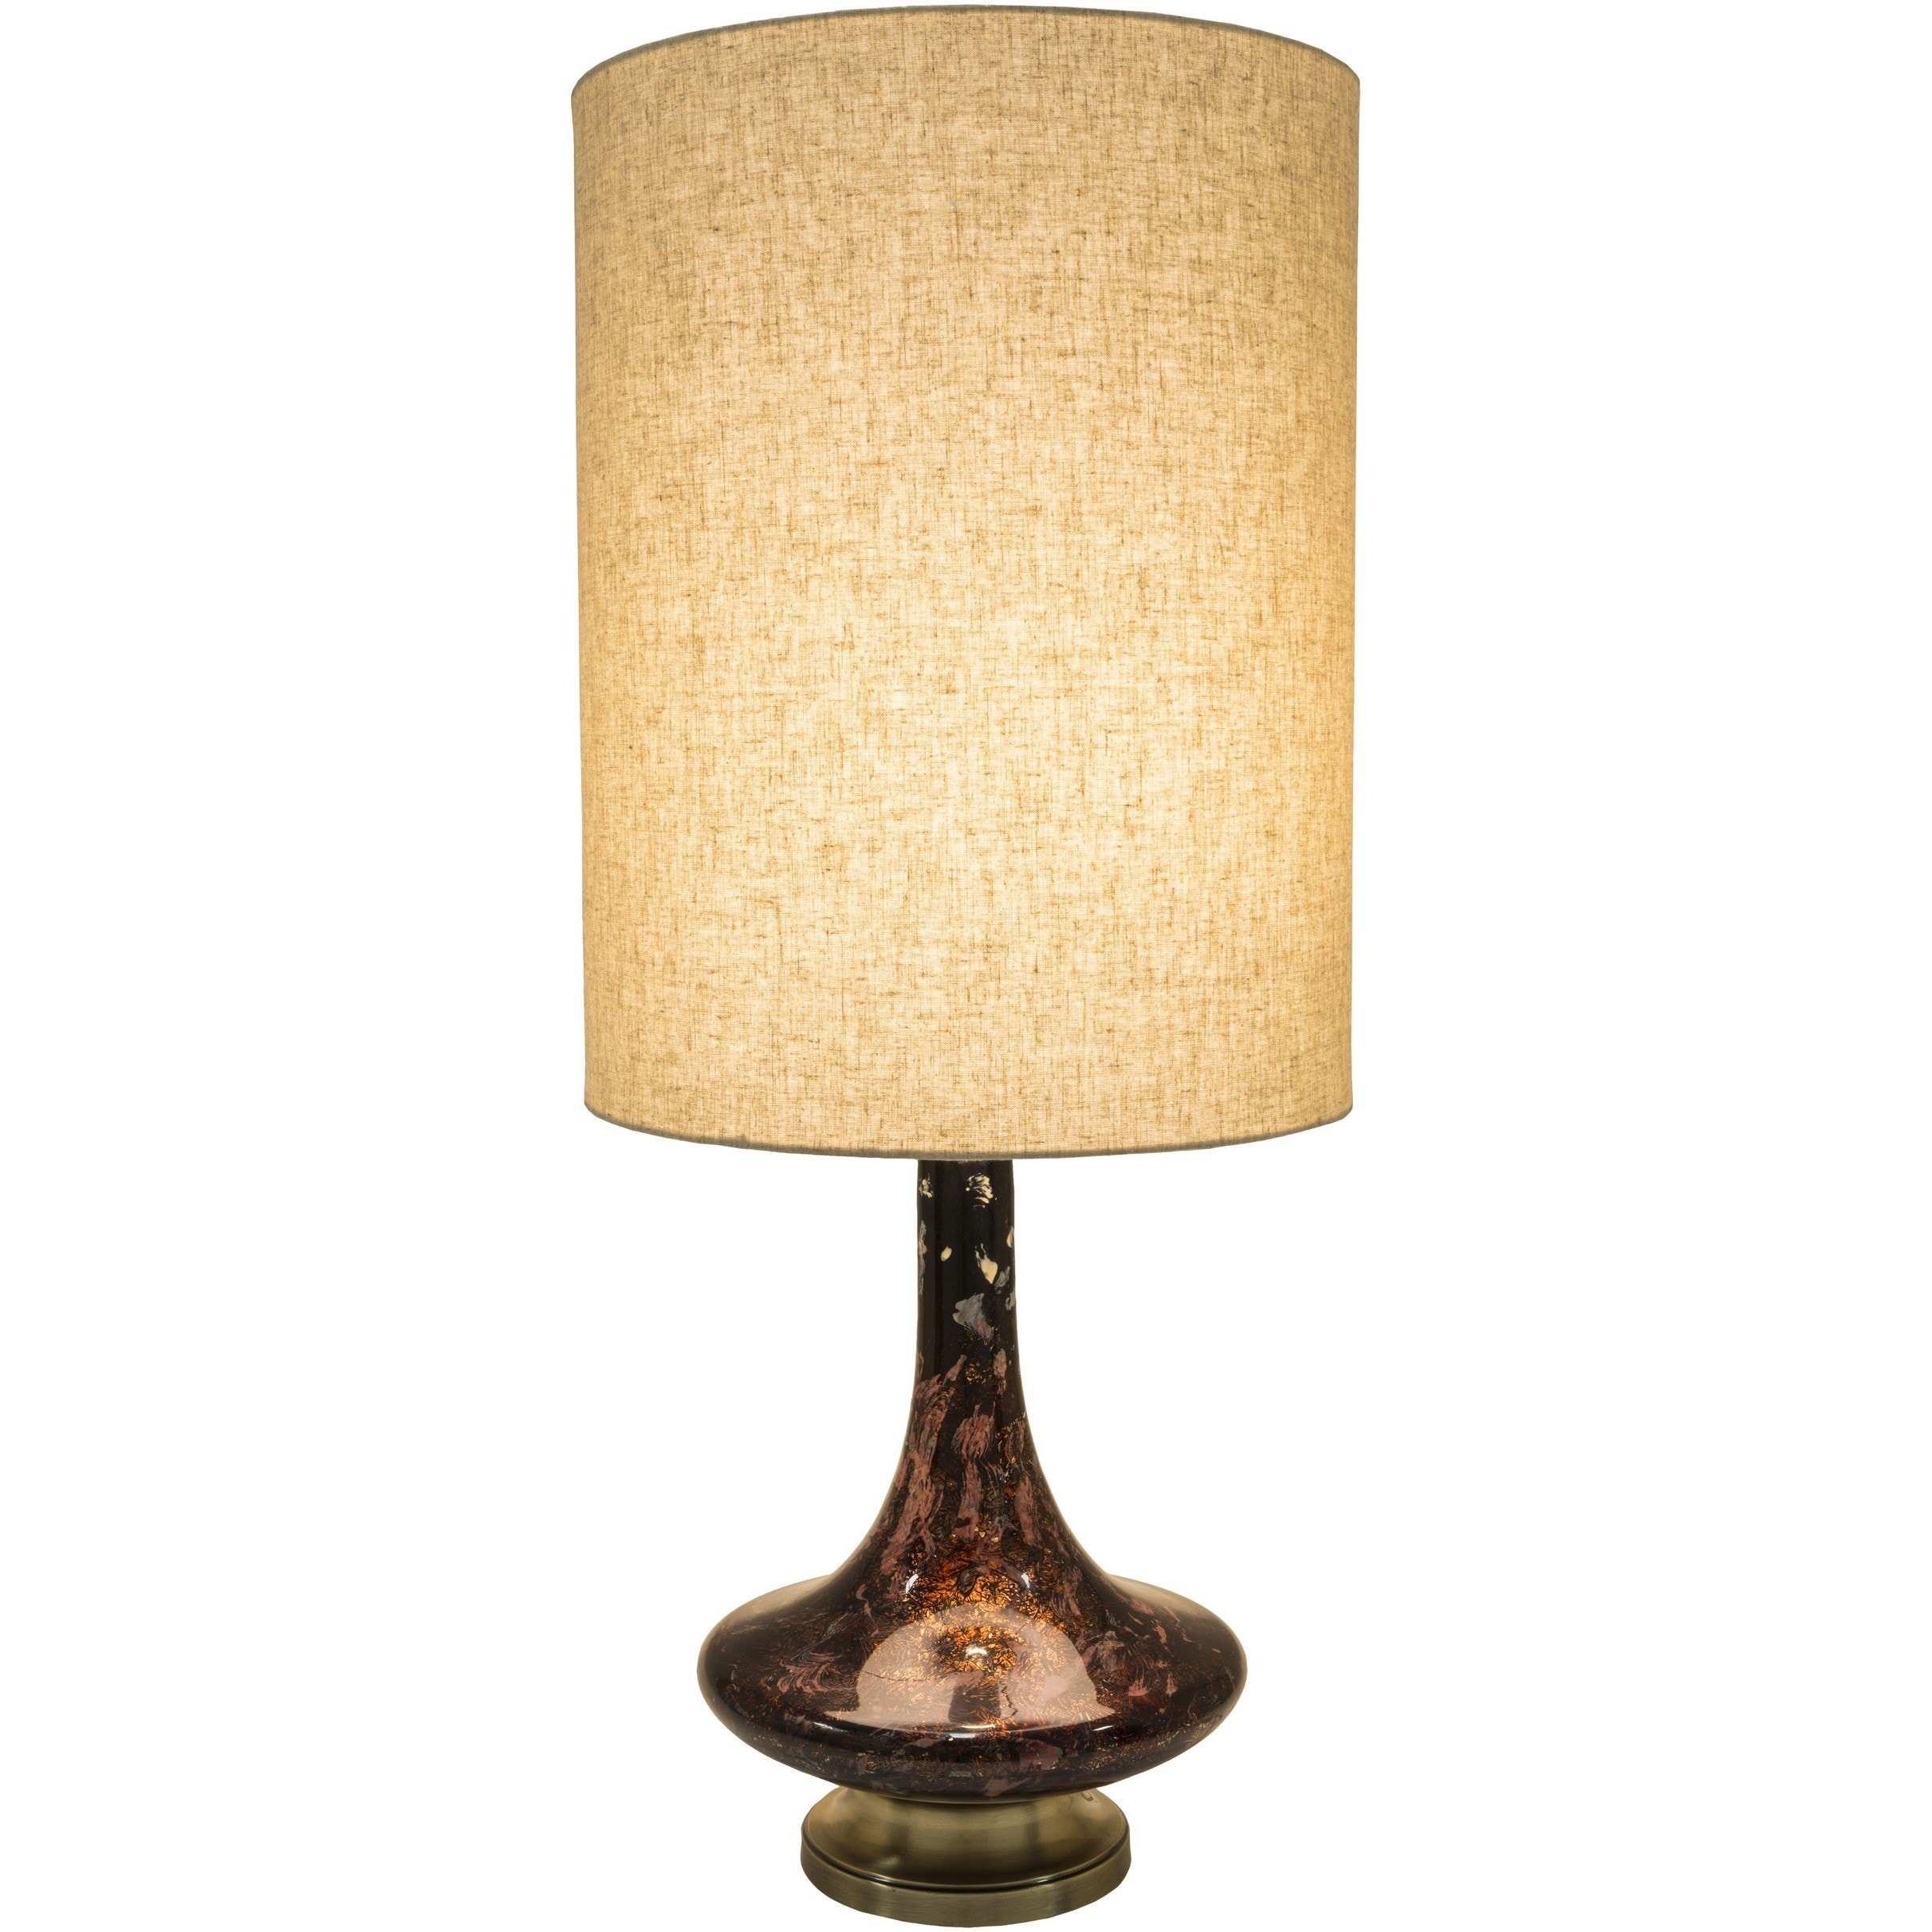 Surya Carpet, Inc. Kamora Table Lamp with Painted Glass Base